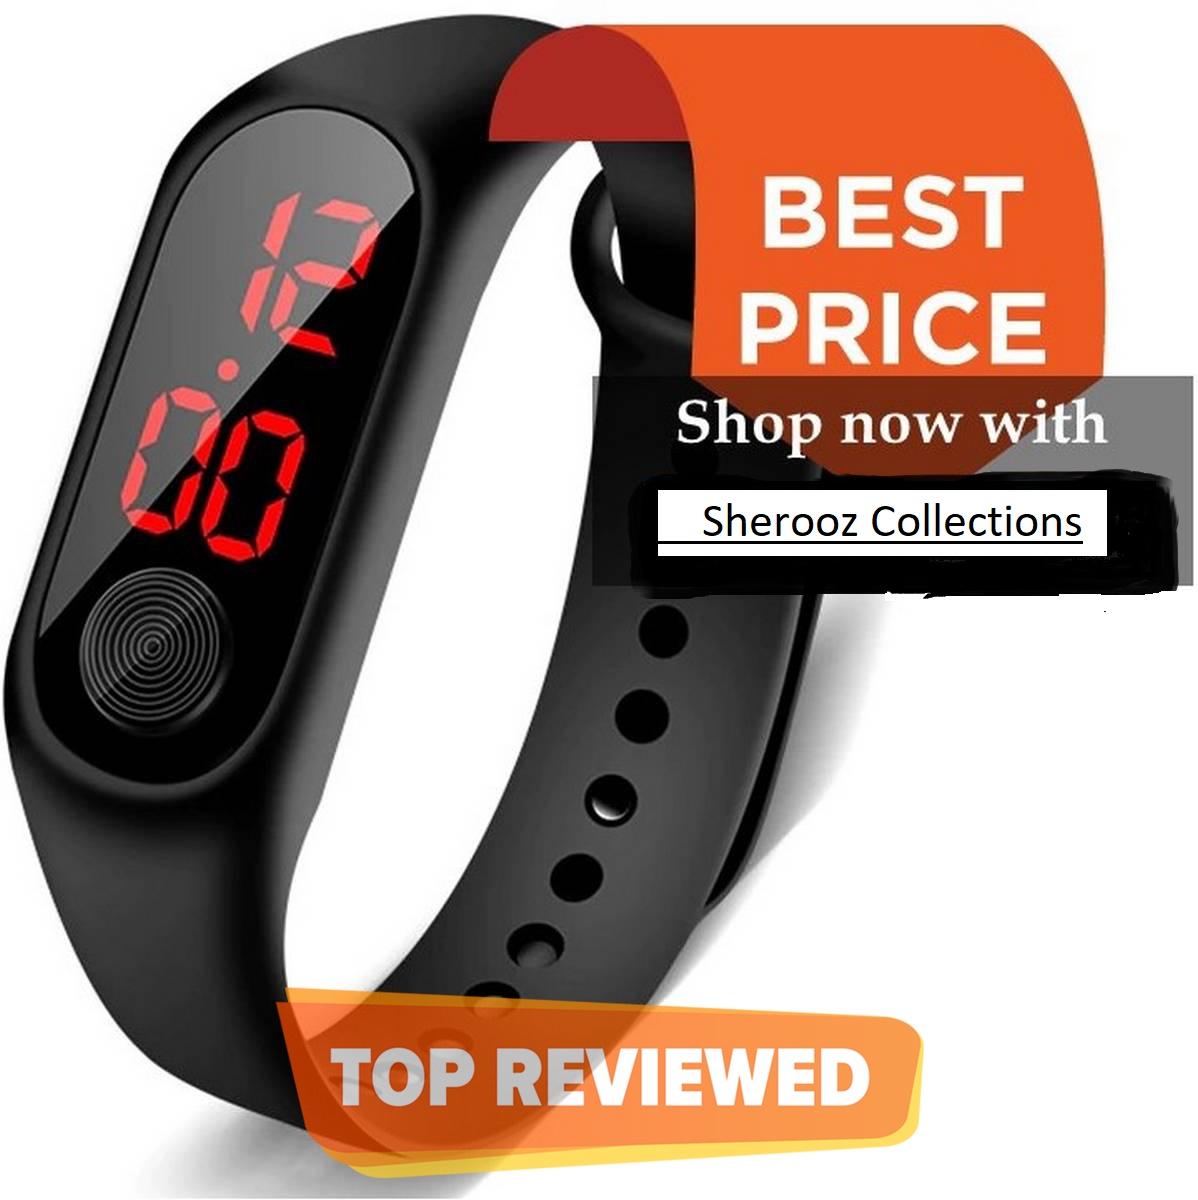 Black Luxury Men Women Sport Casual M3 Led Bracelet Digital Watch Band  Fashion Watch Bracelet For Boys and Girls  Smart Bracelet Led Wrist Watch  Wristband Fitness watch